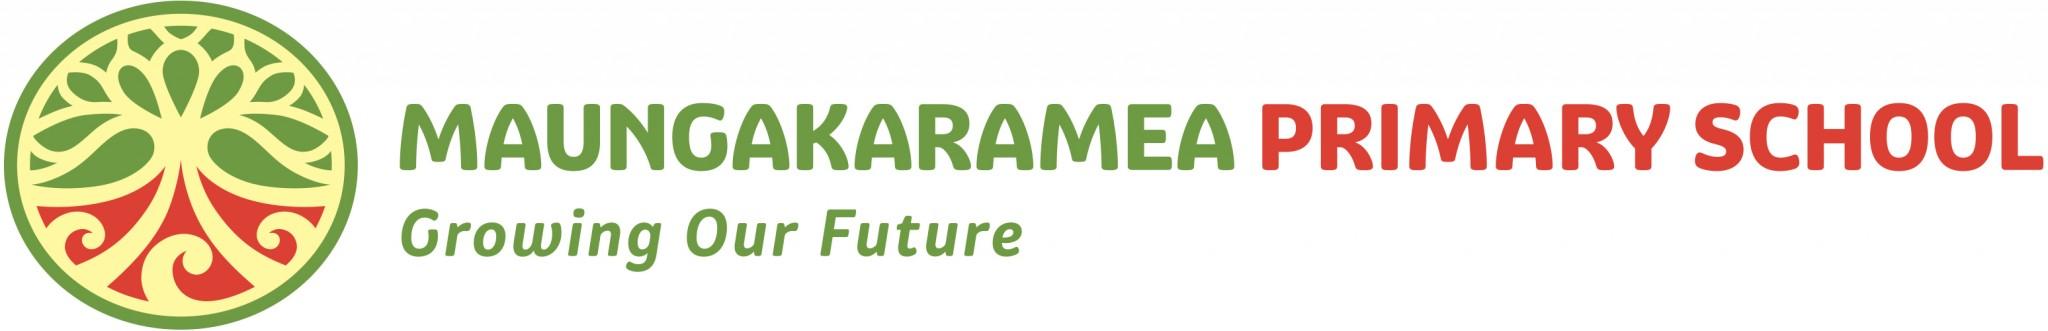 Maungakaramea School Logo